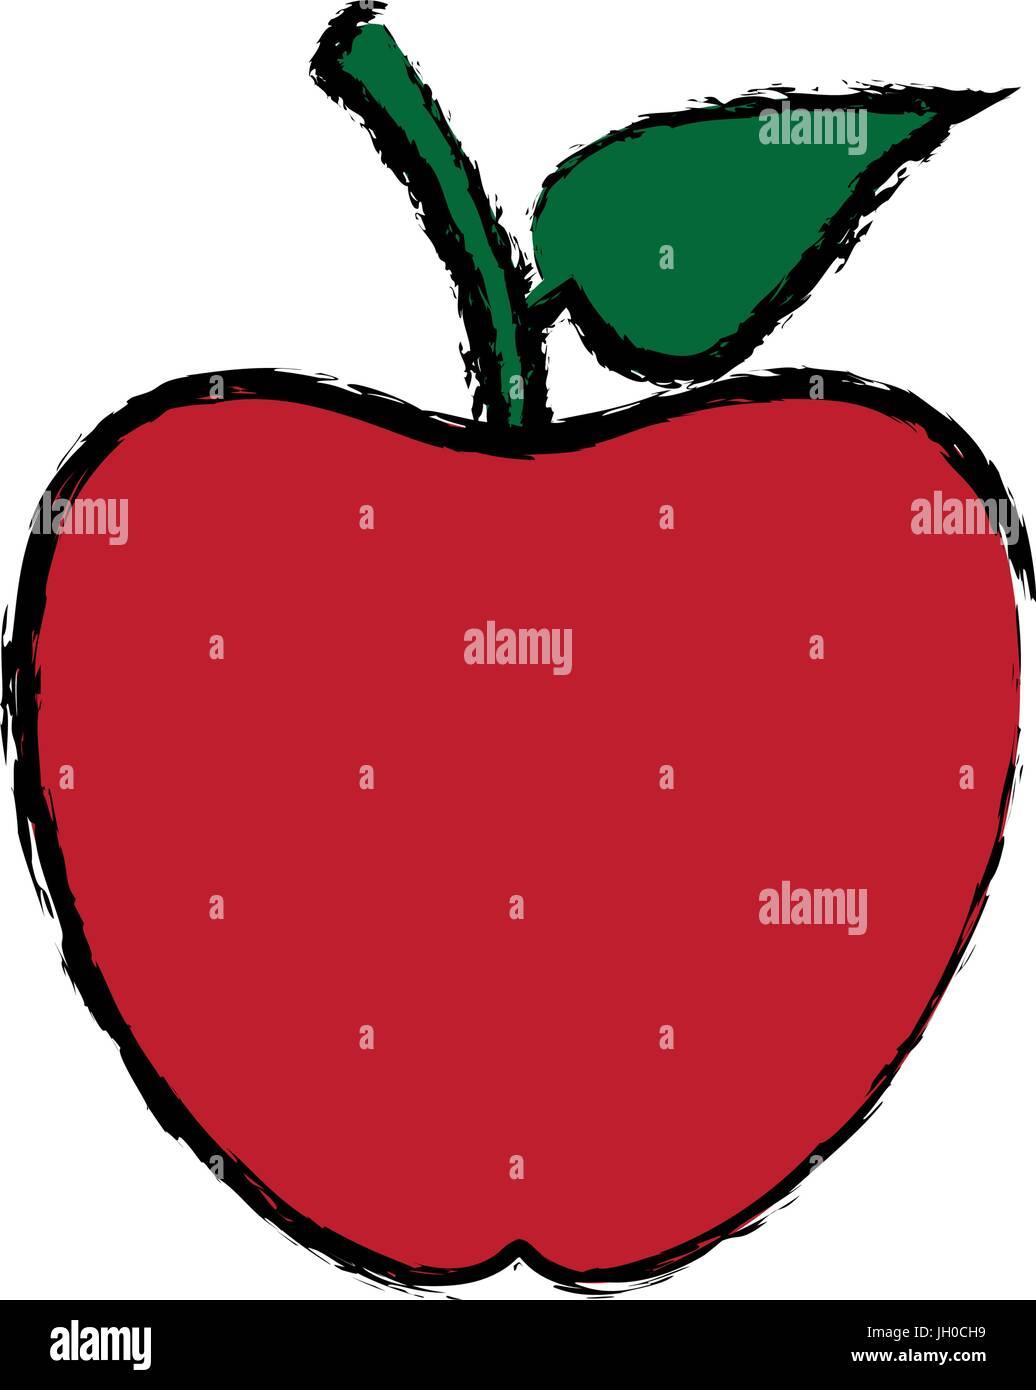 Back to school apple symbol icon stock vector art illustration back to school apple symbol icon buycottarizona